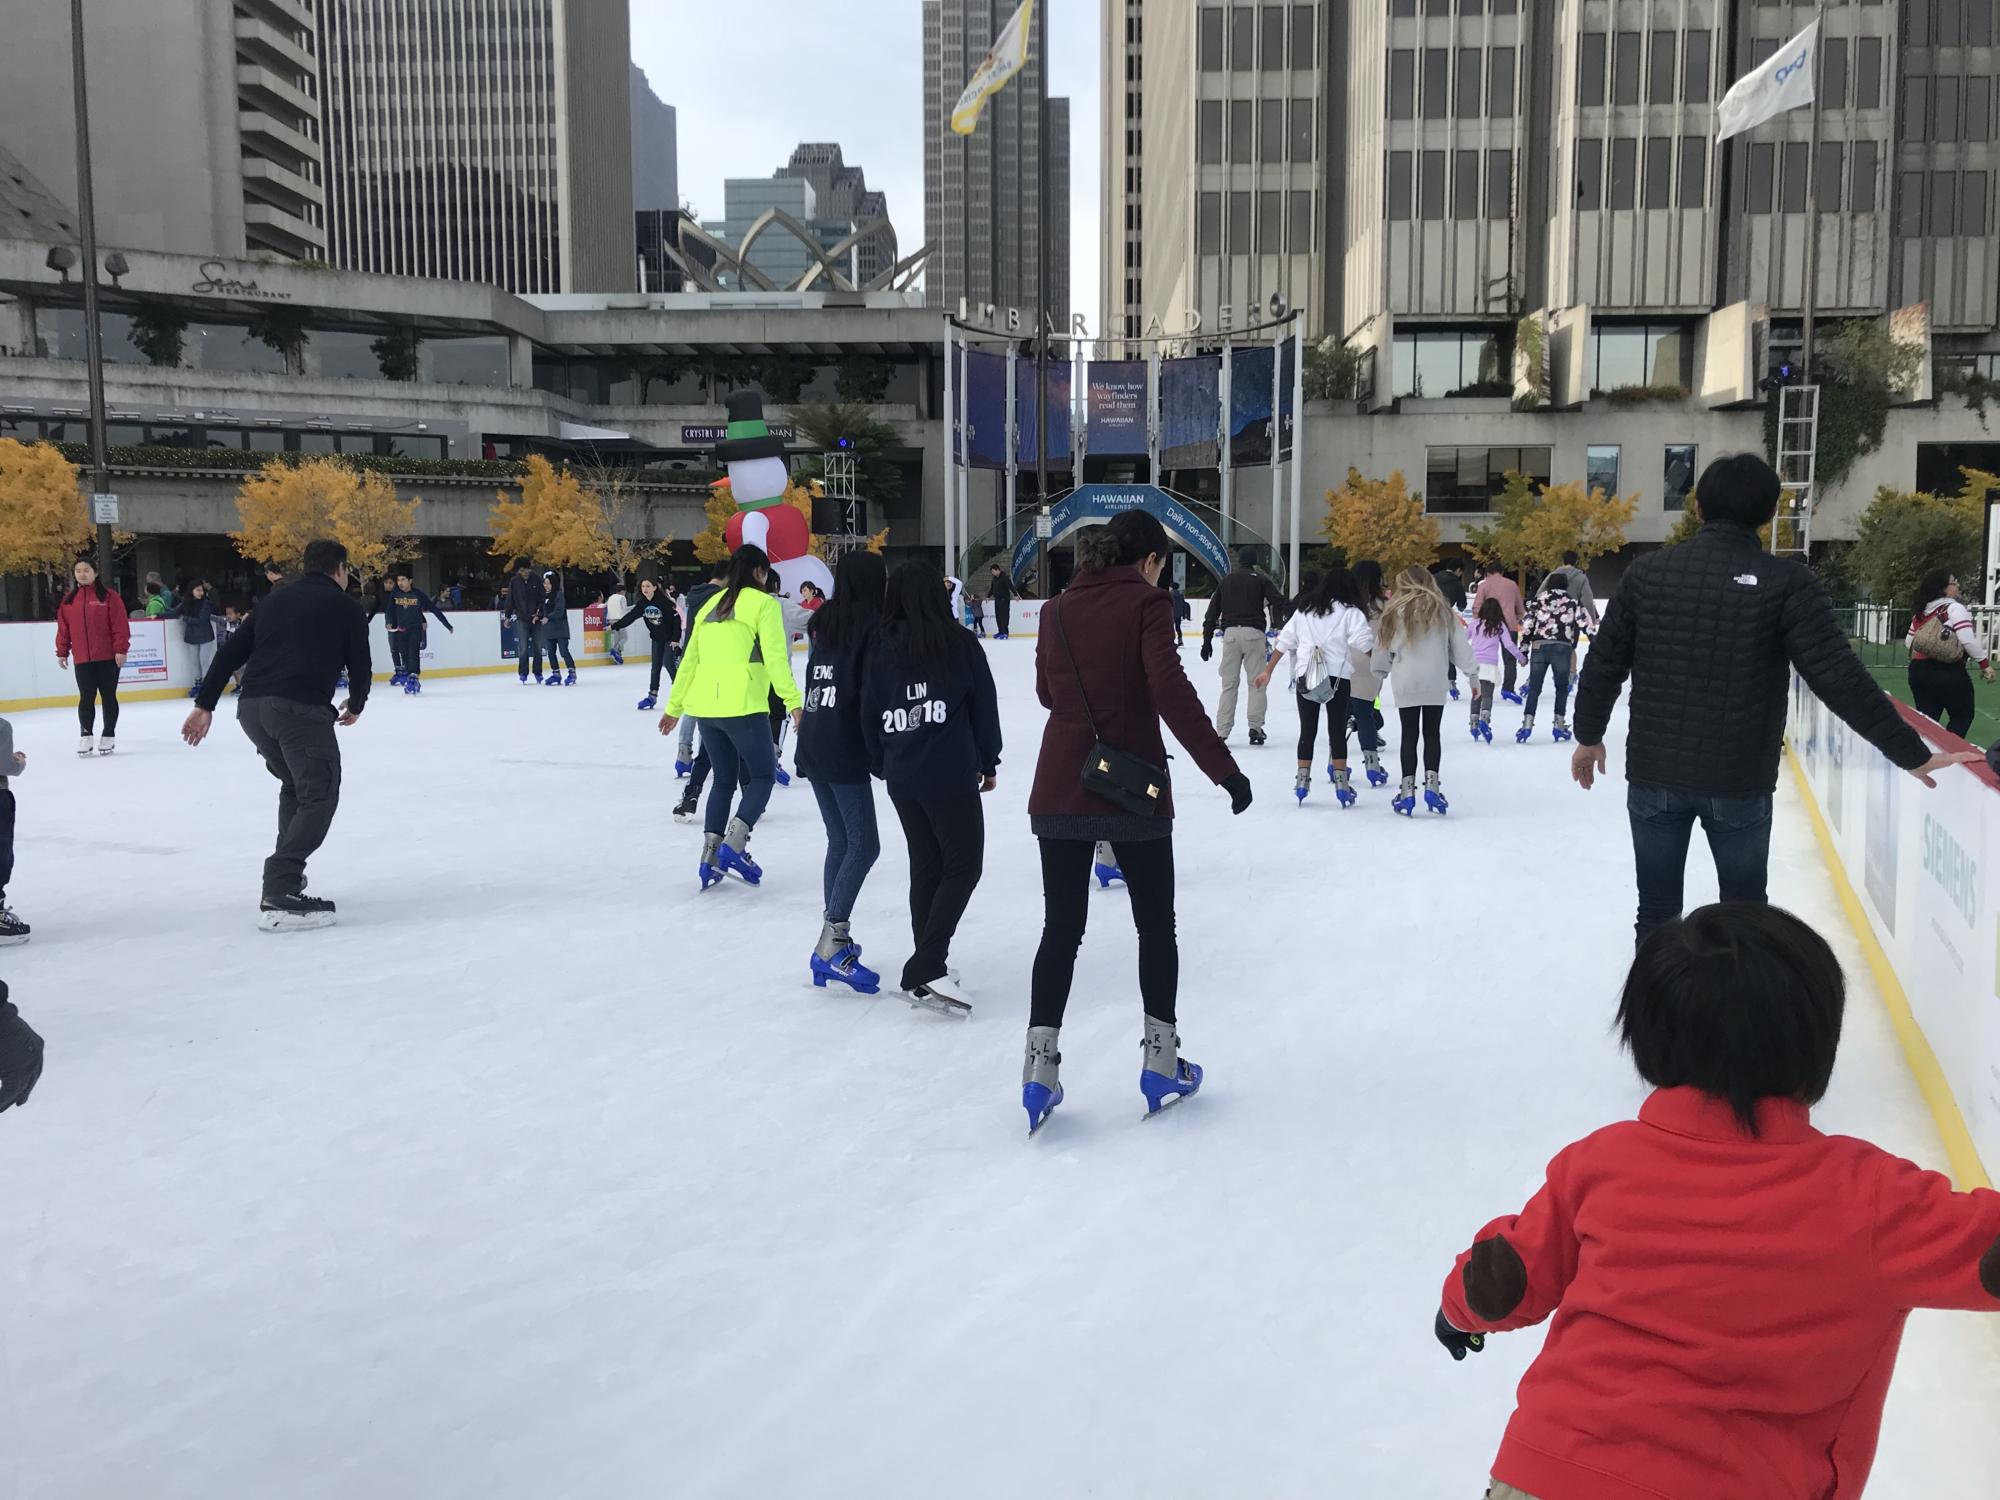 Best outdoor ice skating rinks near Marin